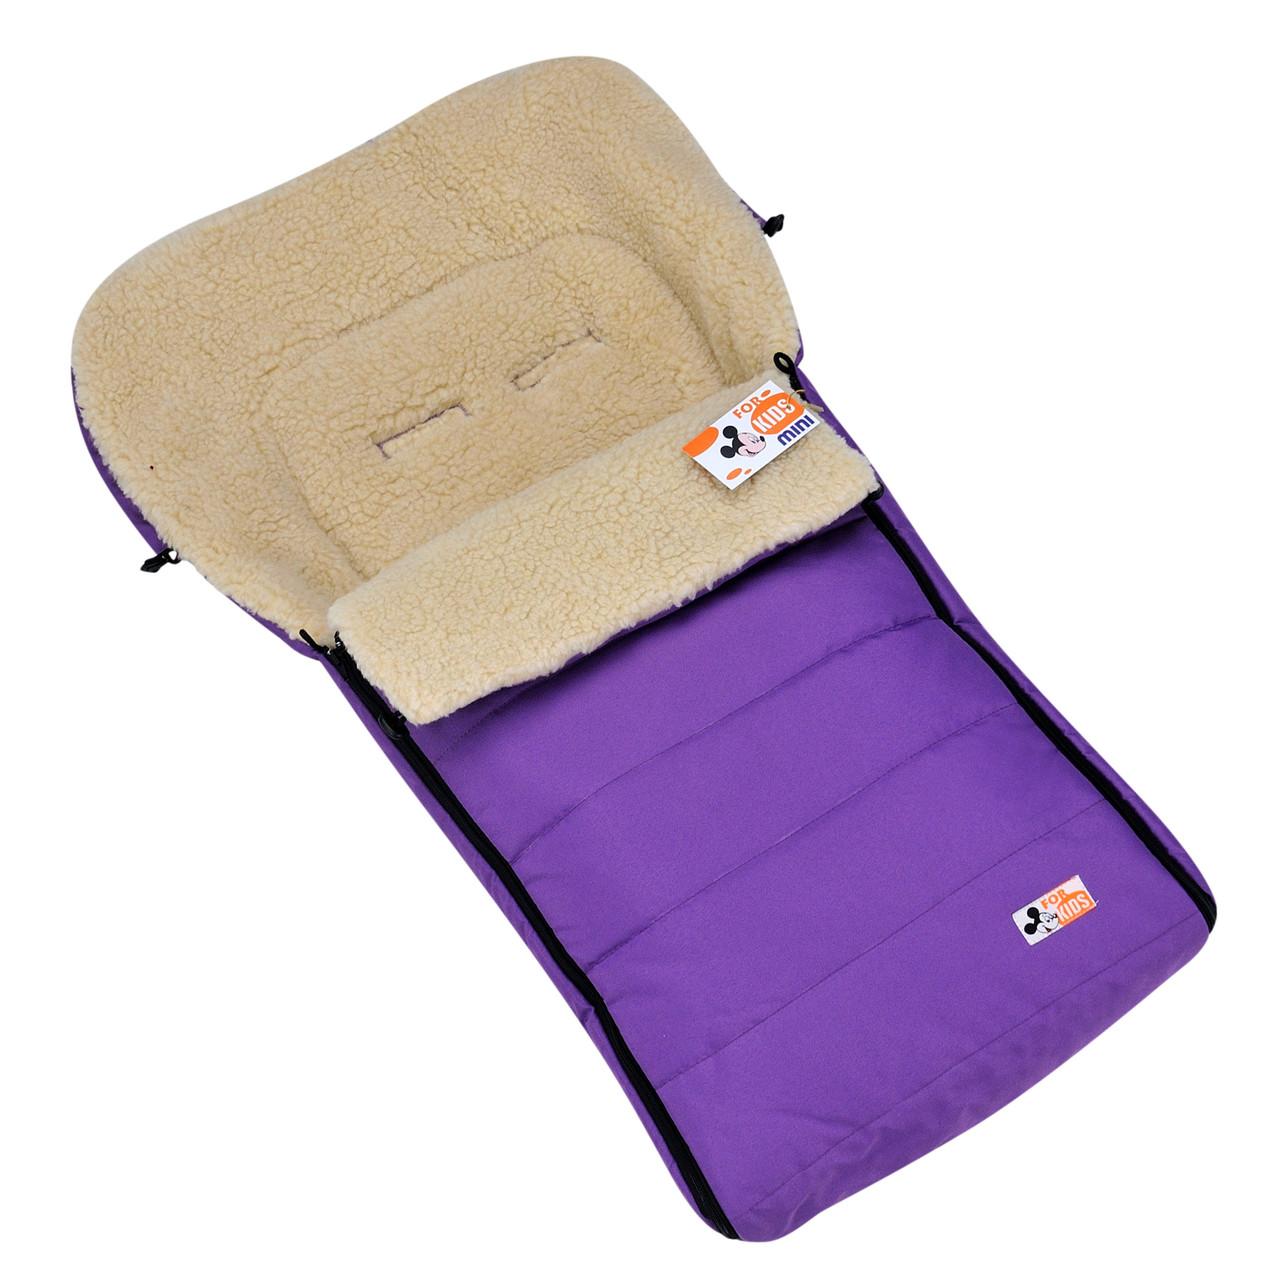 Конверт Чехол на овчине Фиолетовый в коляску санки 92*42 см MINI (For Kids)